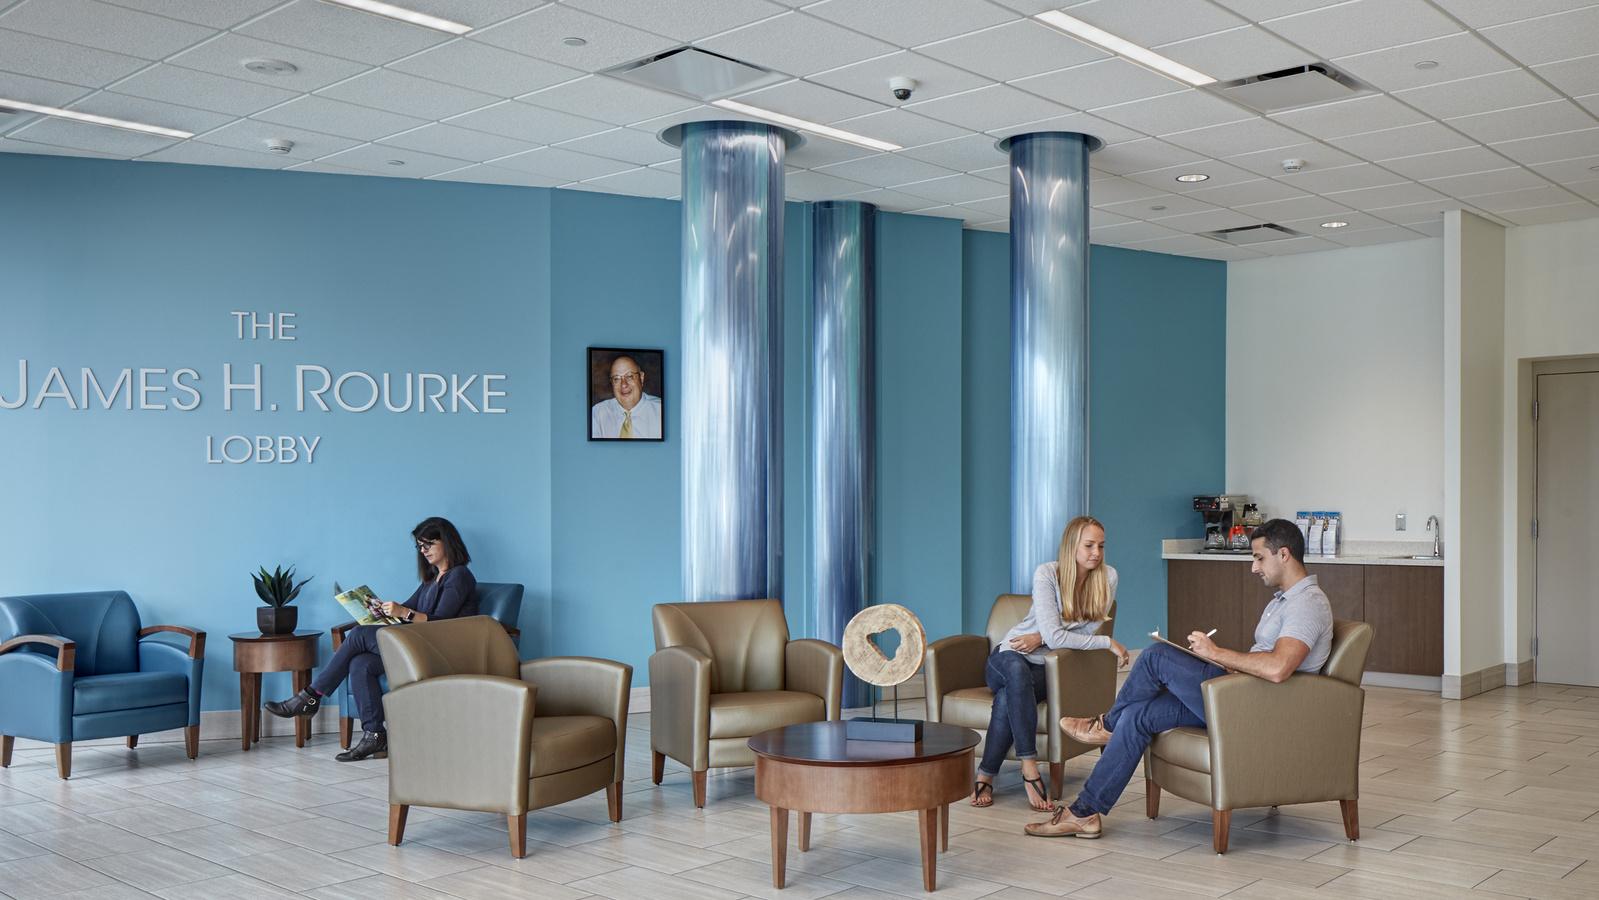 McLaren Karmanos Cancer Institute